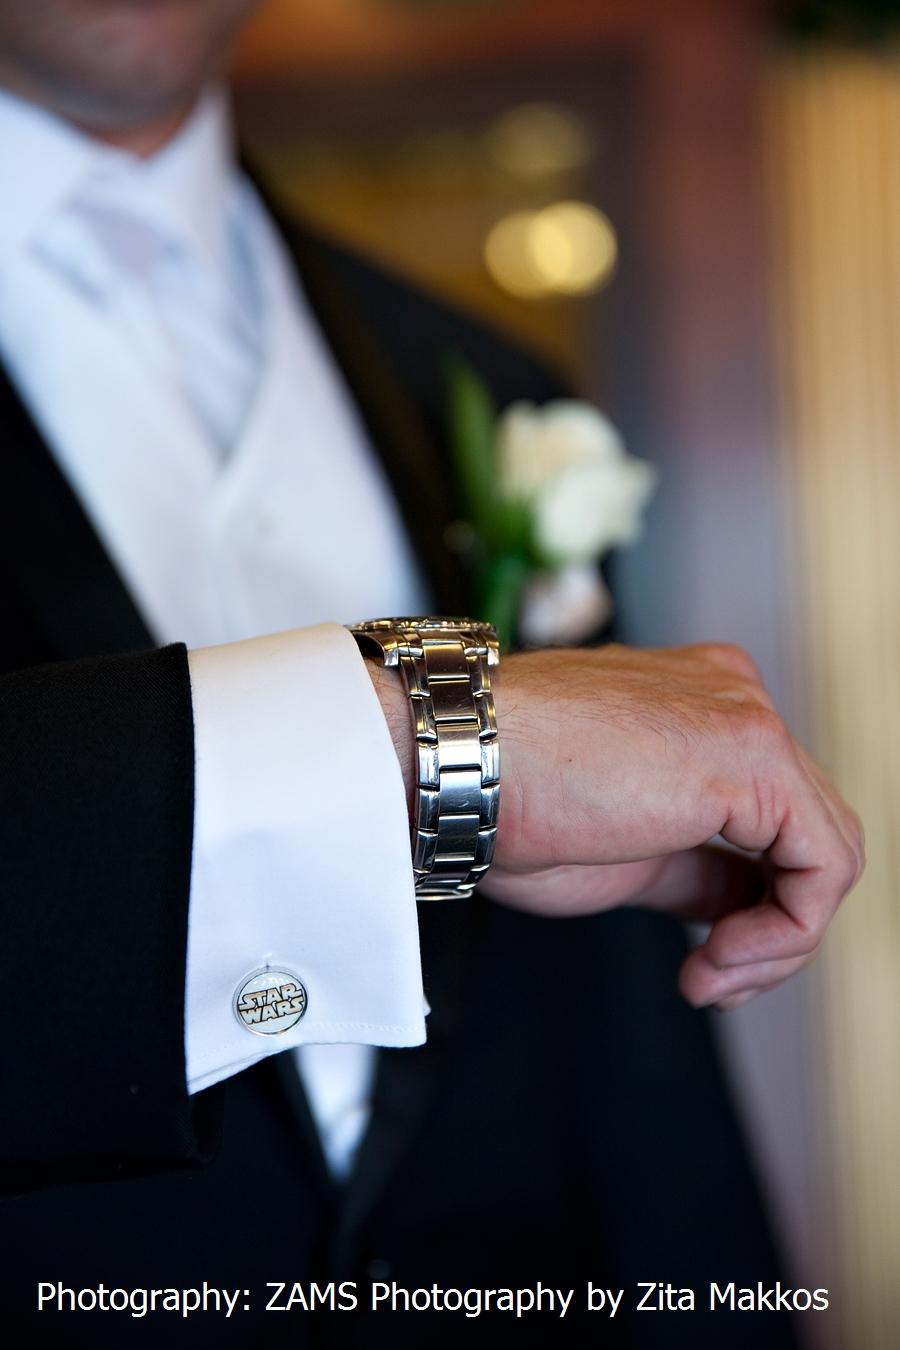 music_bands_the_adicts_2_cuff_links_men_weddings_groomsmen_grooms_dads_gifts_cufflinks_2.jpg